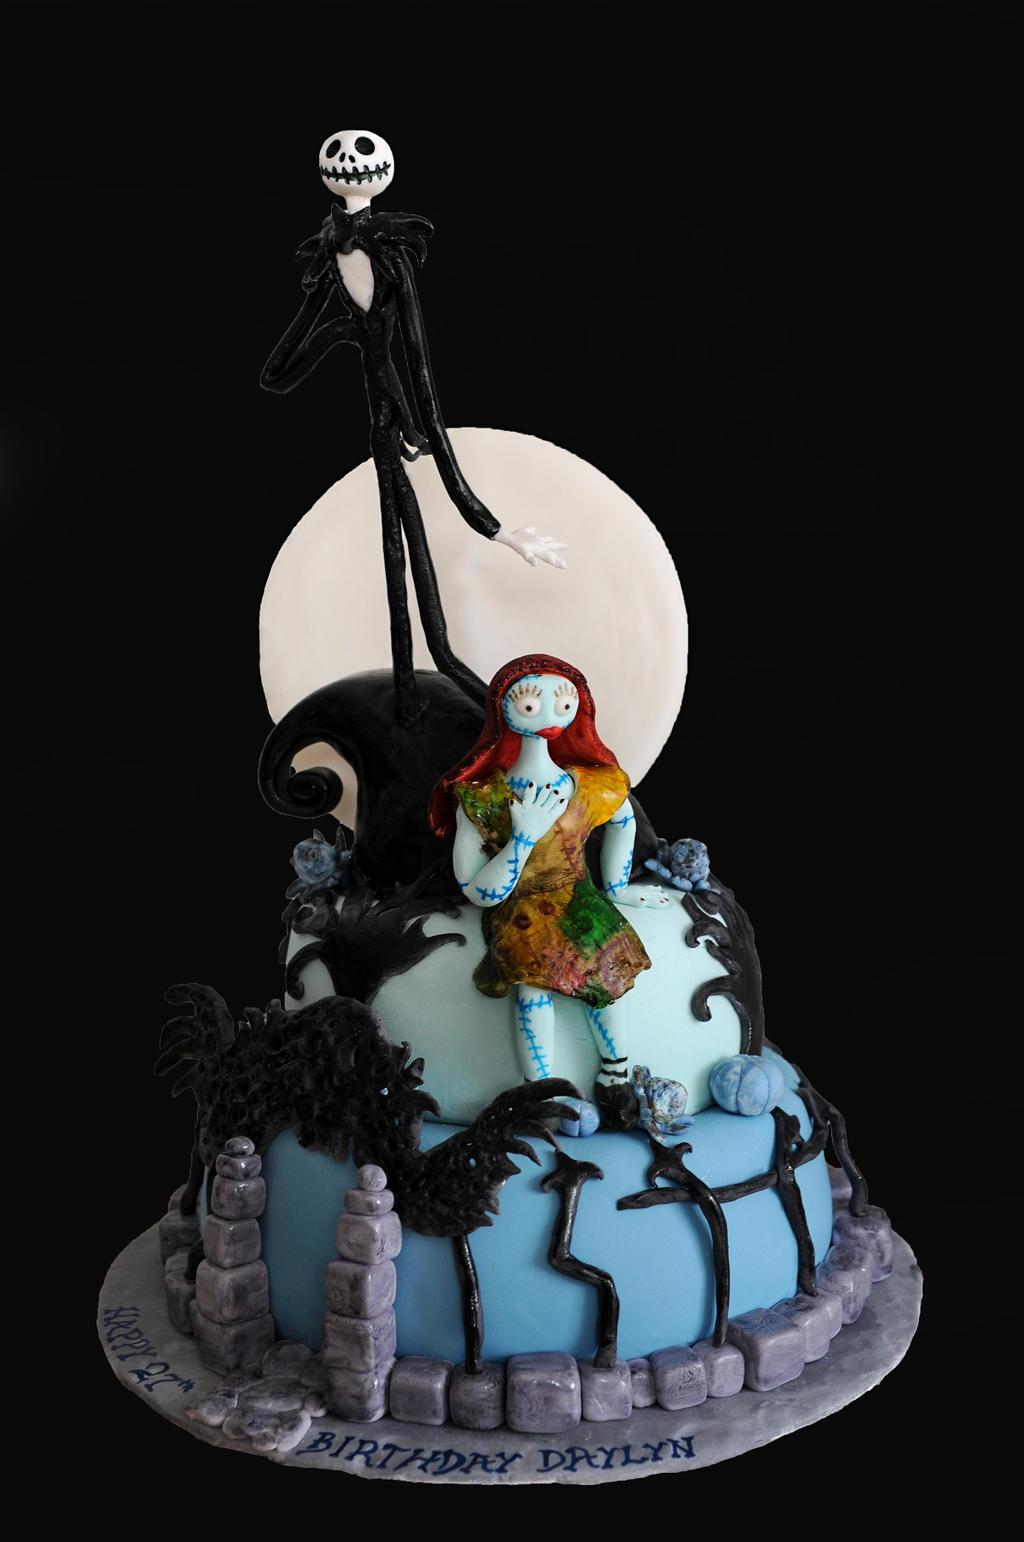 Nightmare Before Christmas Cake by KayleyMackay on DeviantArt